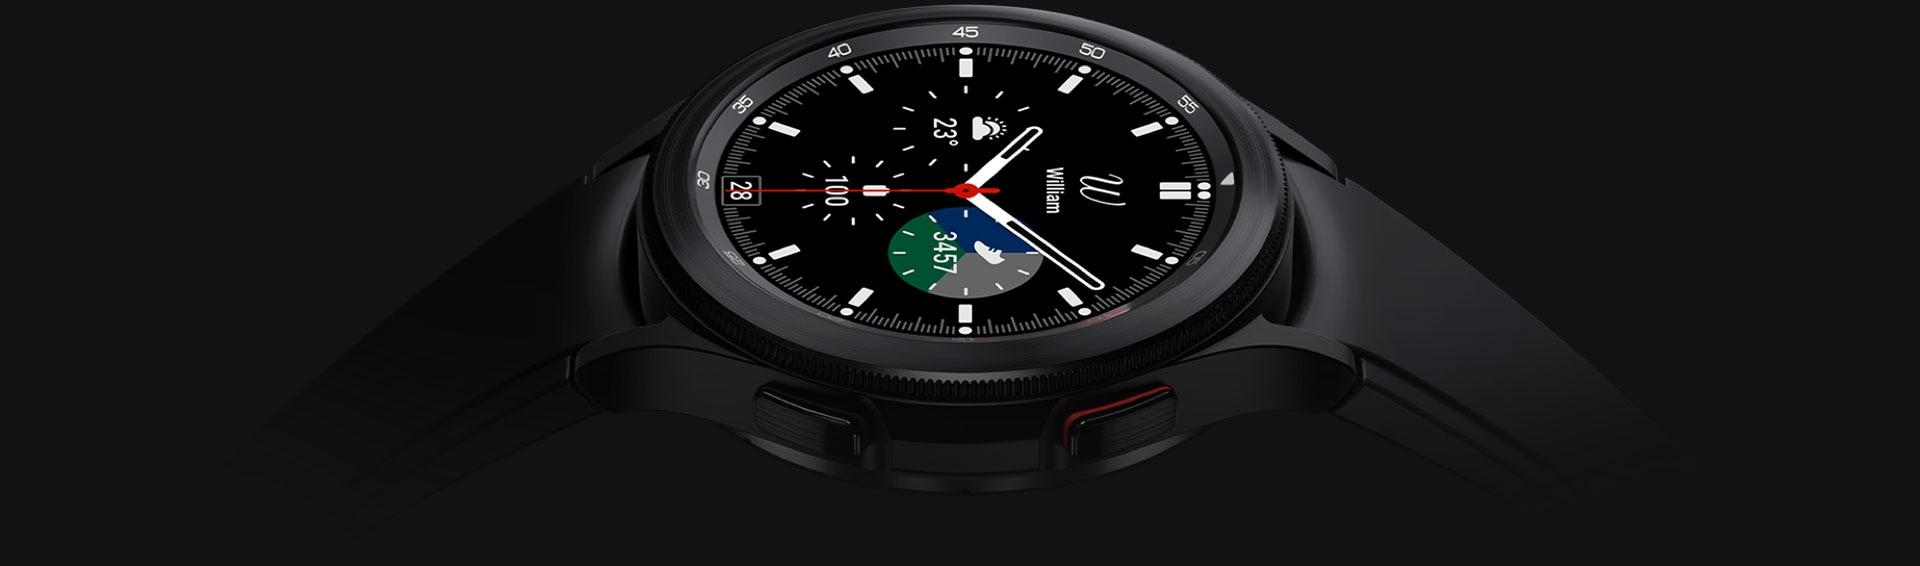 galaxy Watch 4 Classic prix tunisie